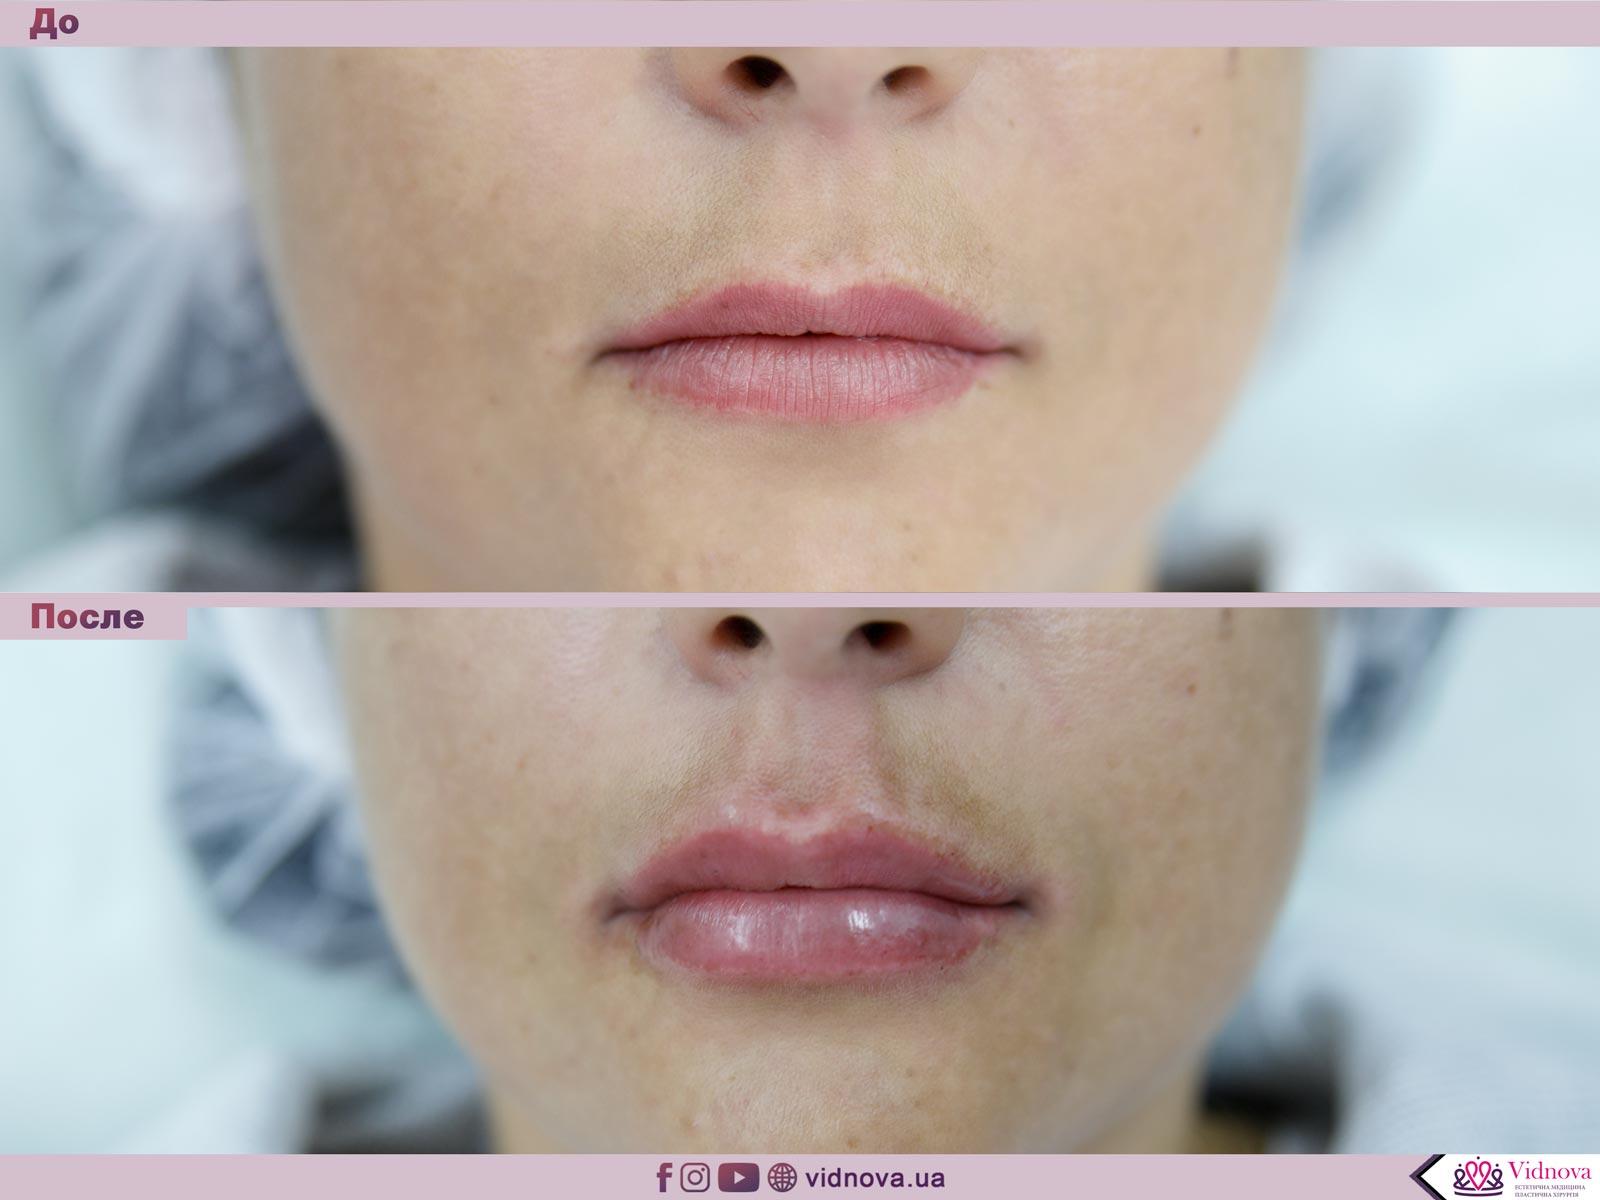 Увеличение губ: Фото До и После - Пример №16-1 - Клиника Vidnova